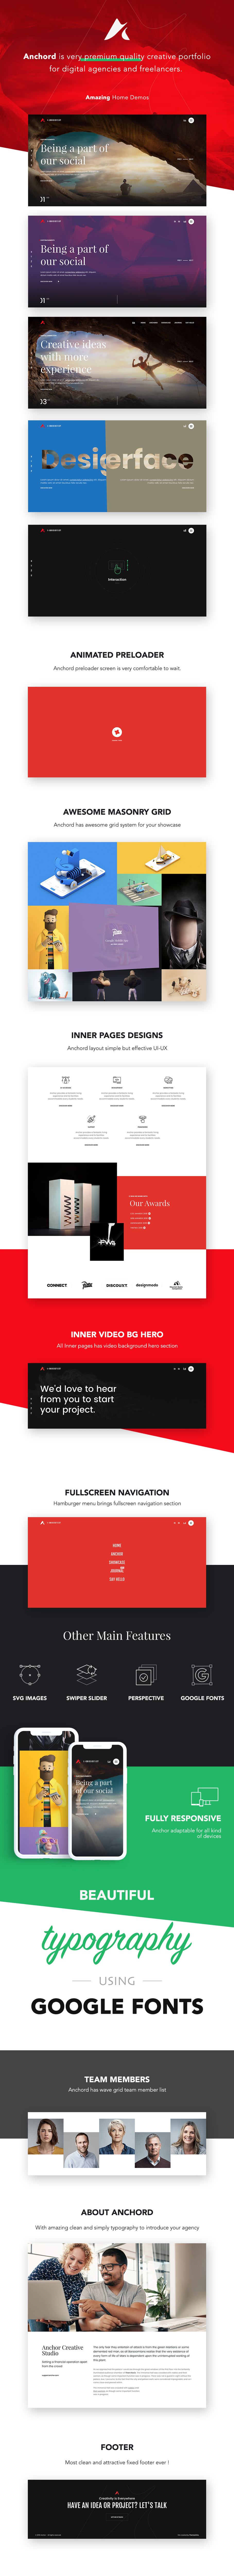 Anchord | Freelancer & Creative Agency Portfolio Theme - 1